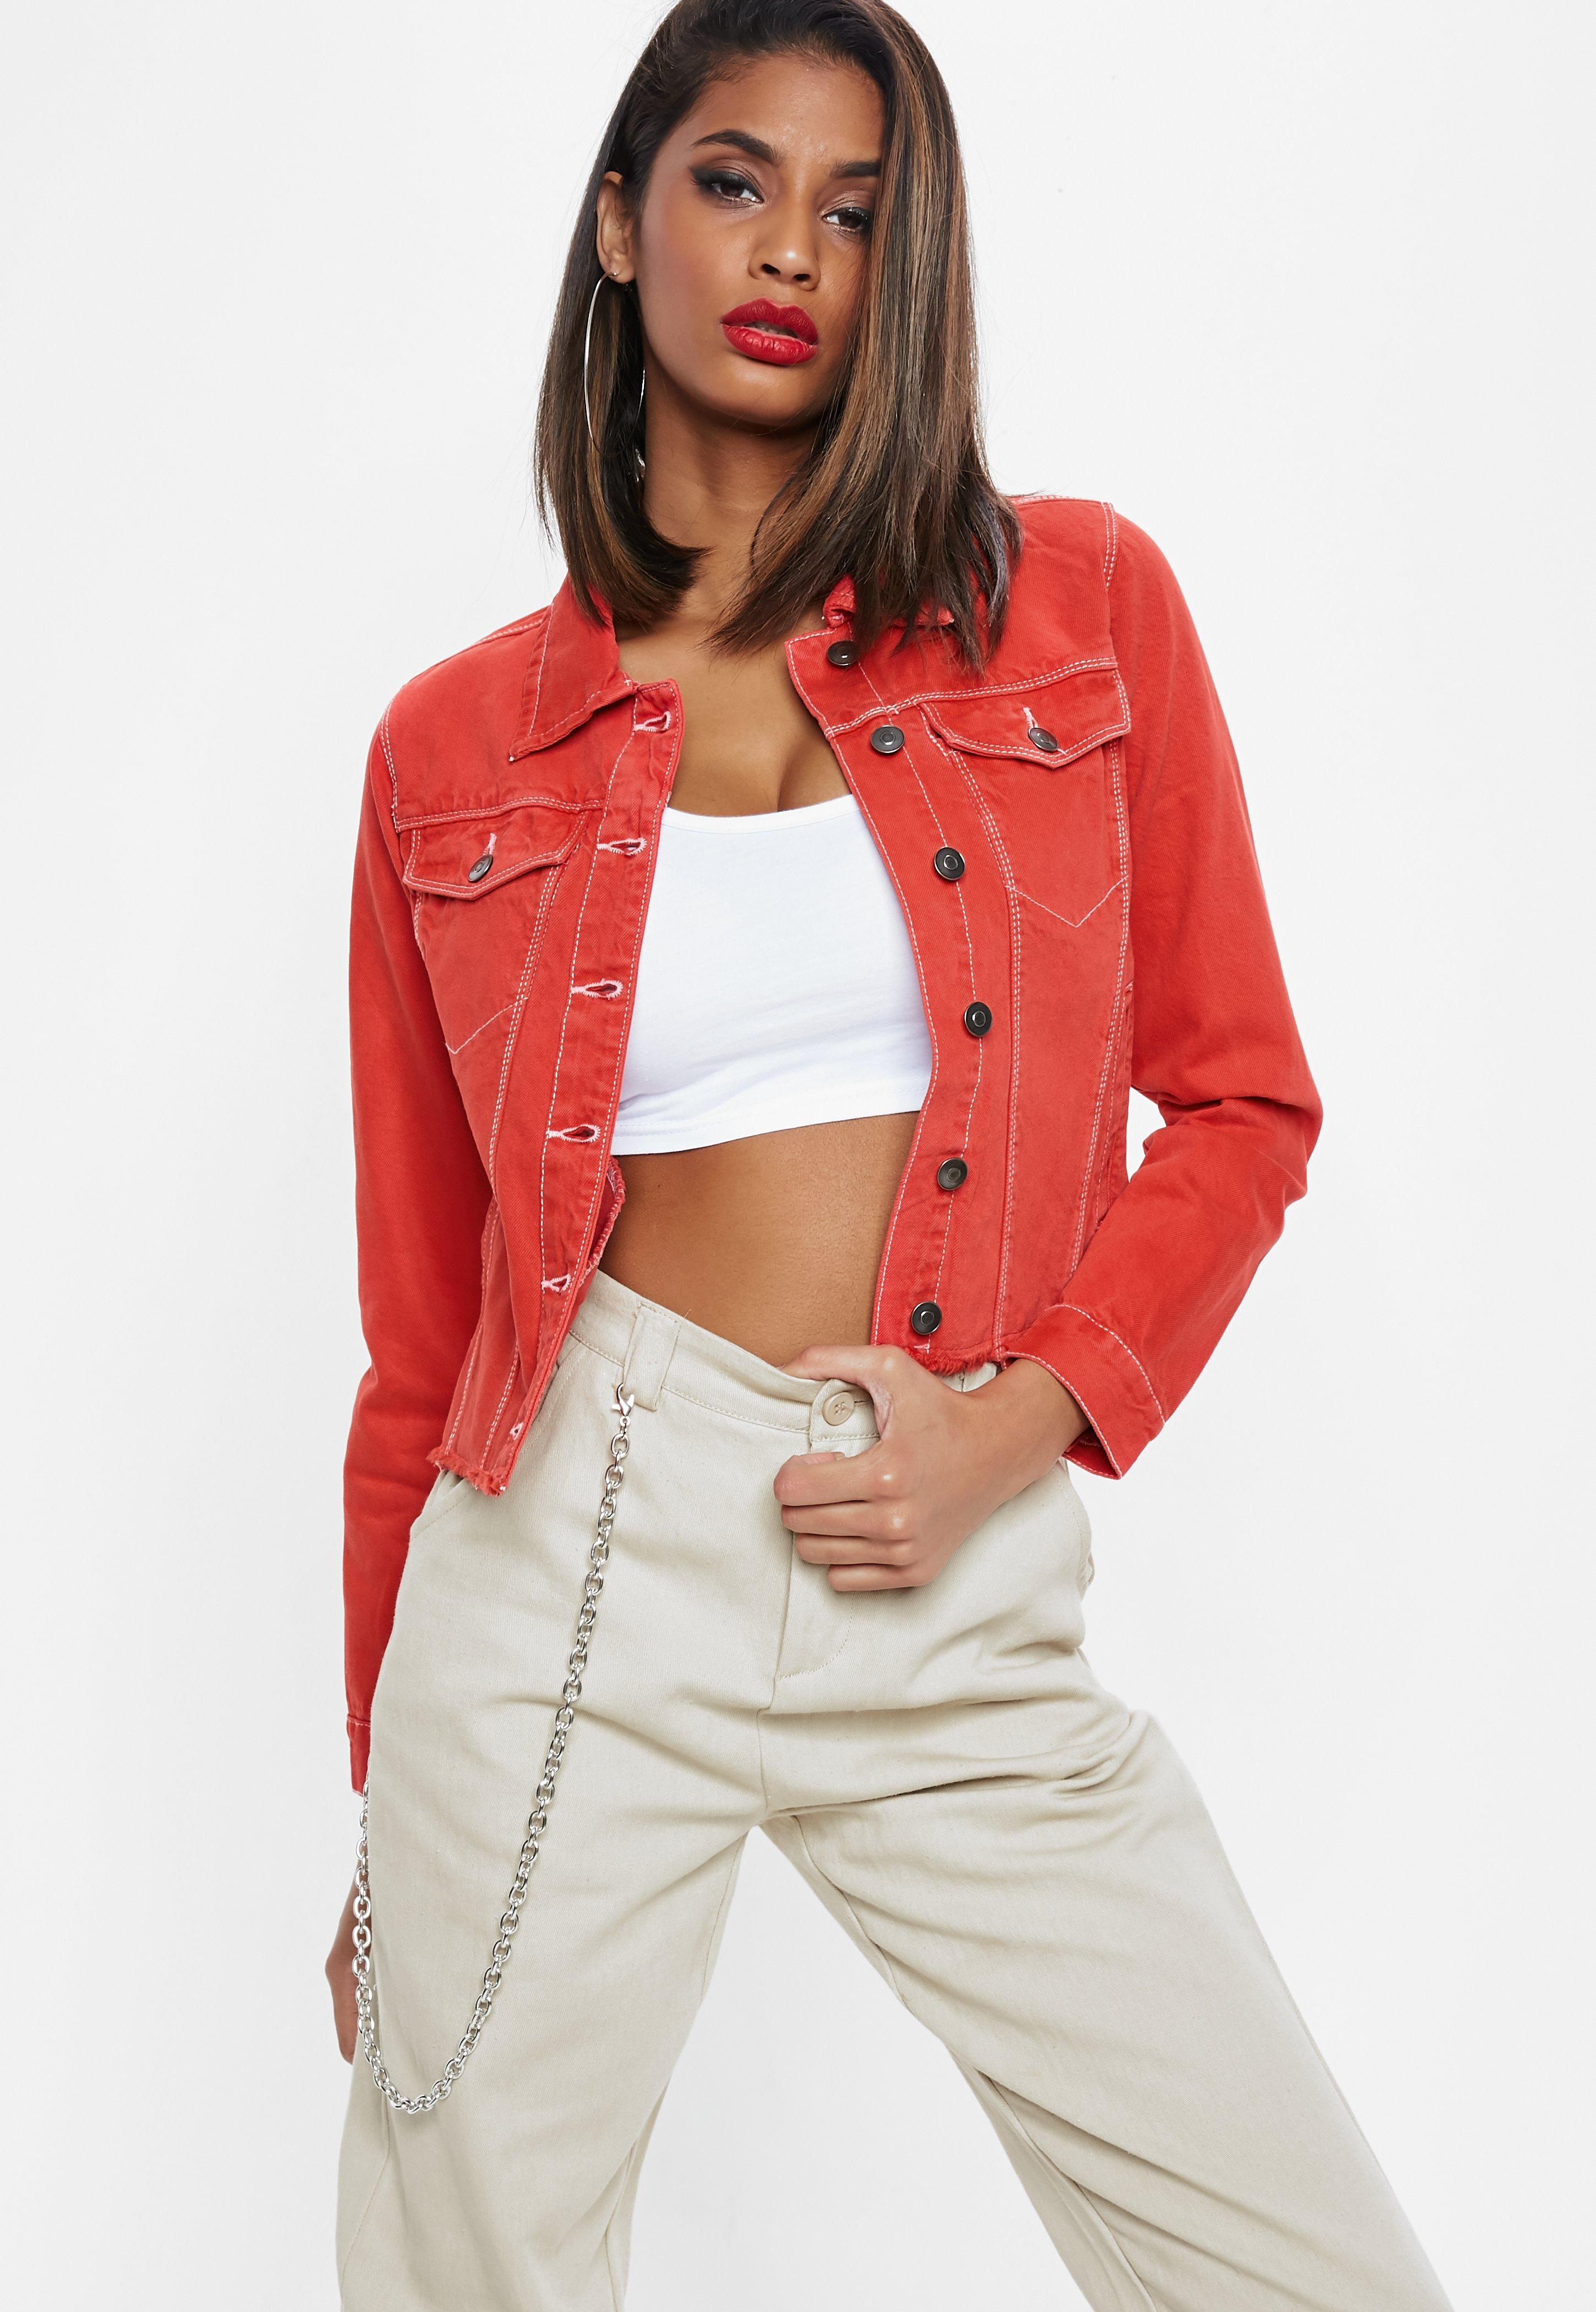 Rote jeansjacke zerrissen